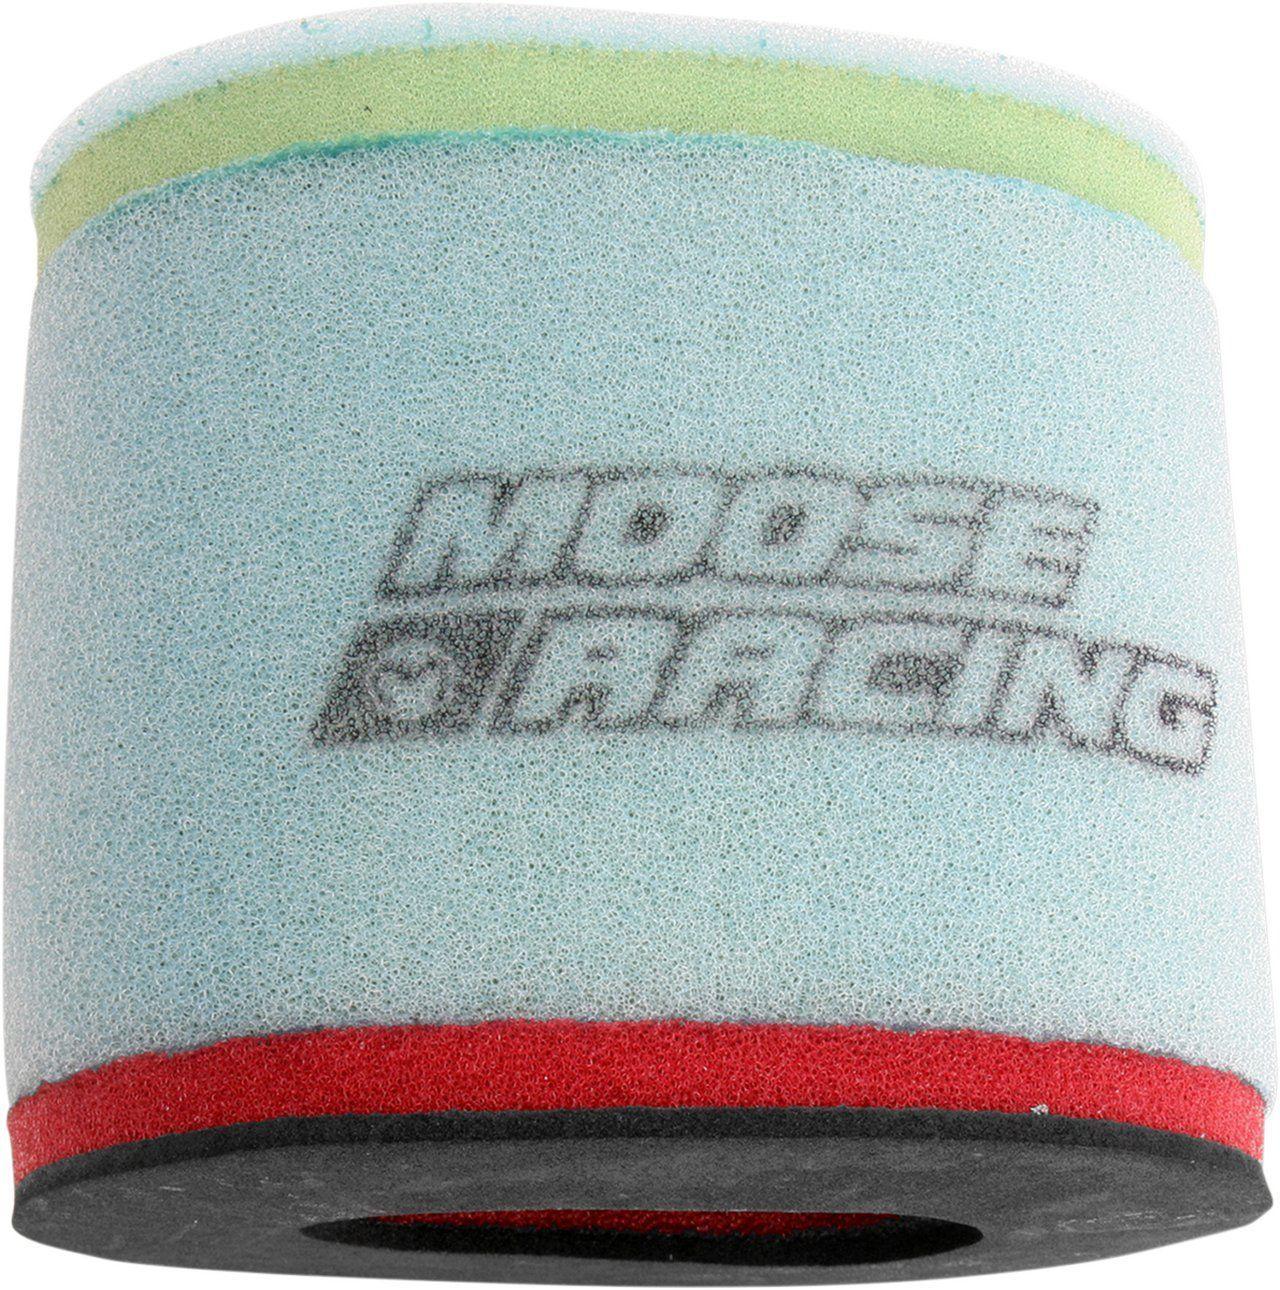 【MOOSE RACING】PPO (PRECISION PRE-OILED) 空氣濾芯 [1011-2548] - 「Webike-摩托百貨」